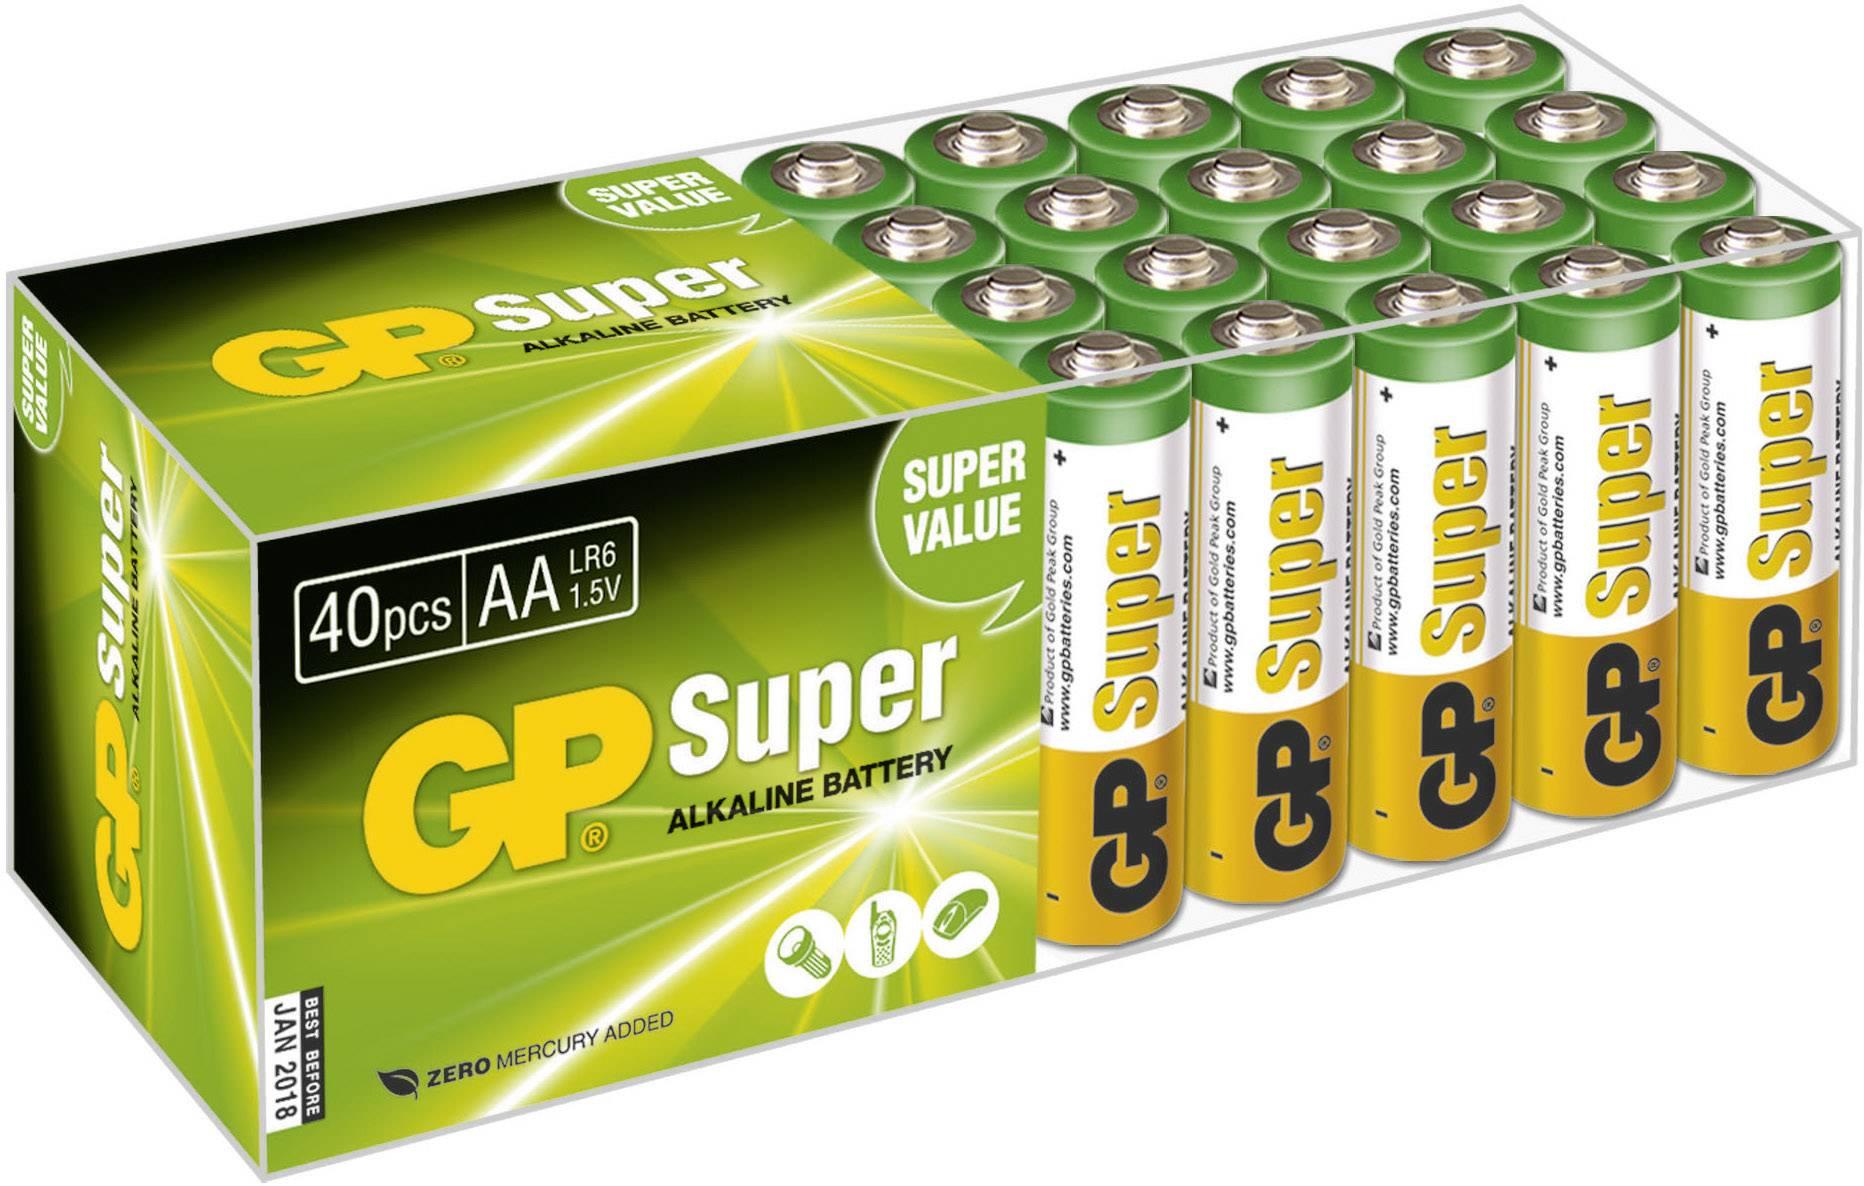 Tužková baterie AA alkalicko-manganová GP Batteries Super Alkaline, 1.5 V, 40 ks